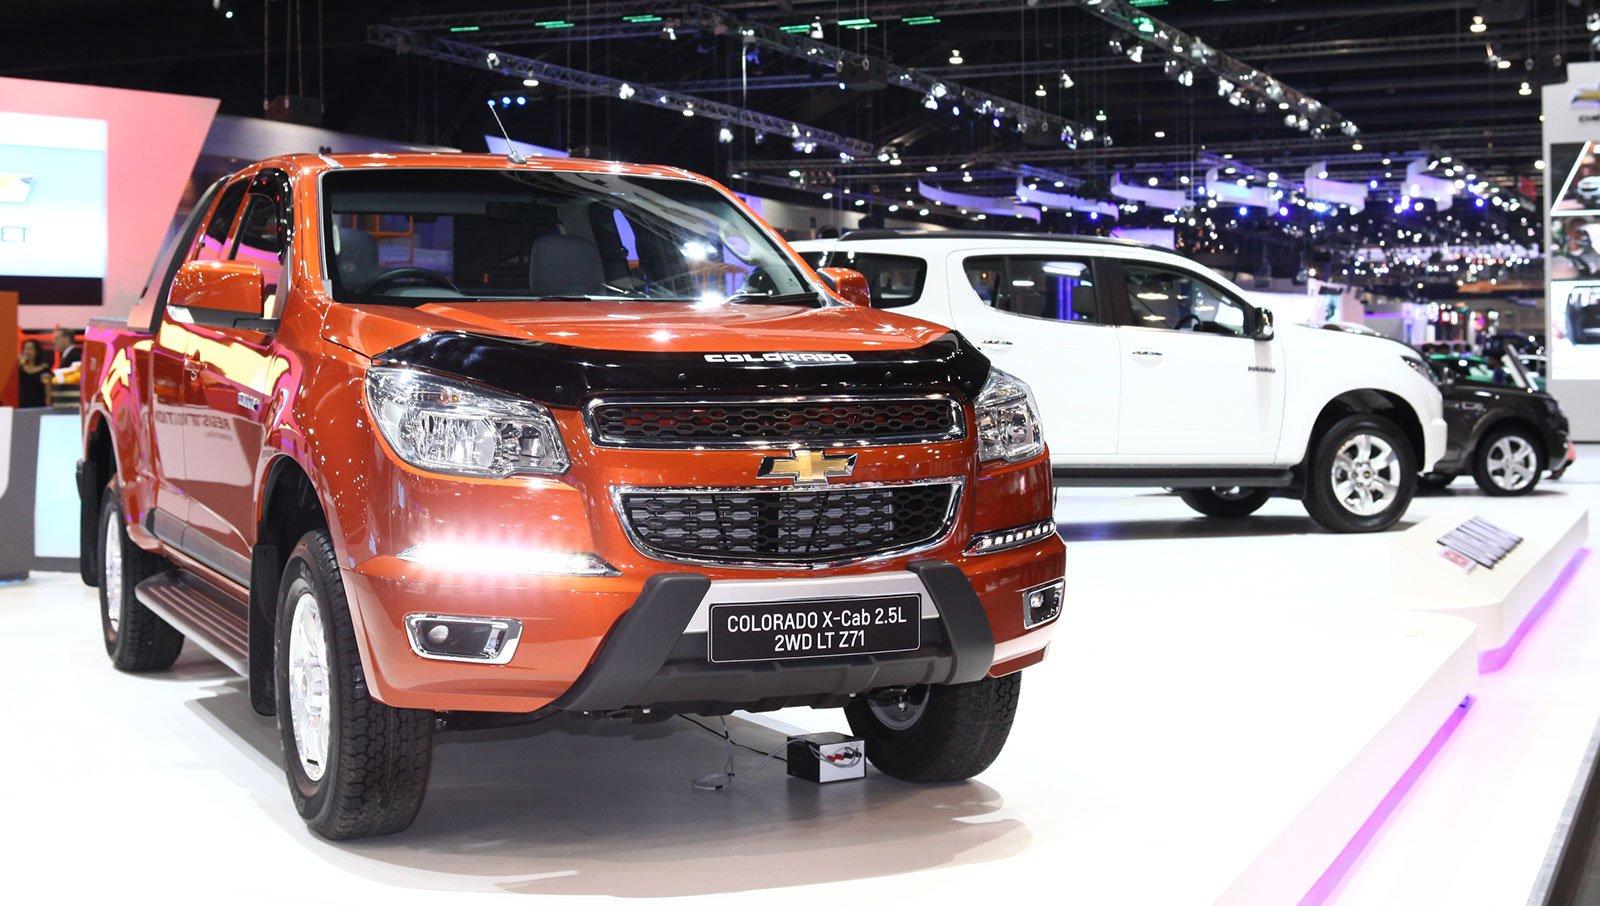 Kelebihan Chevrolet Colorado 2014 Harga